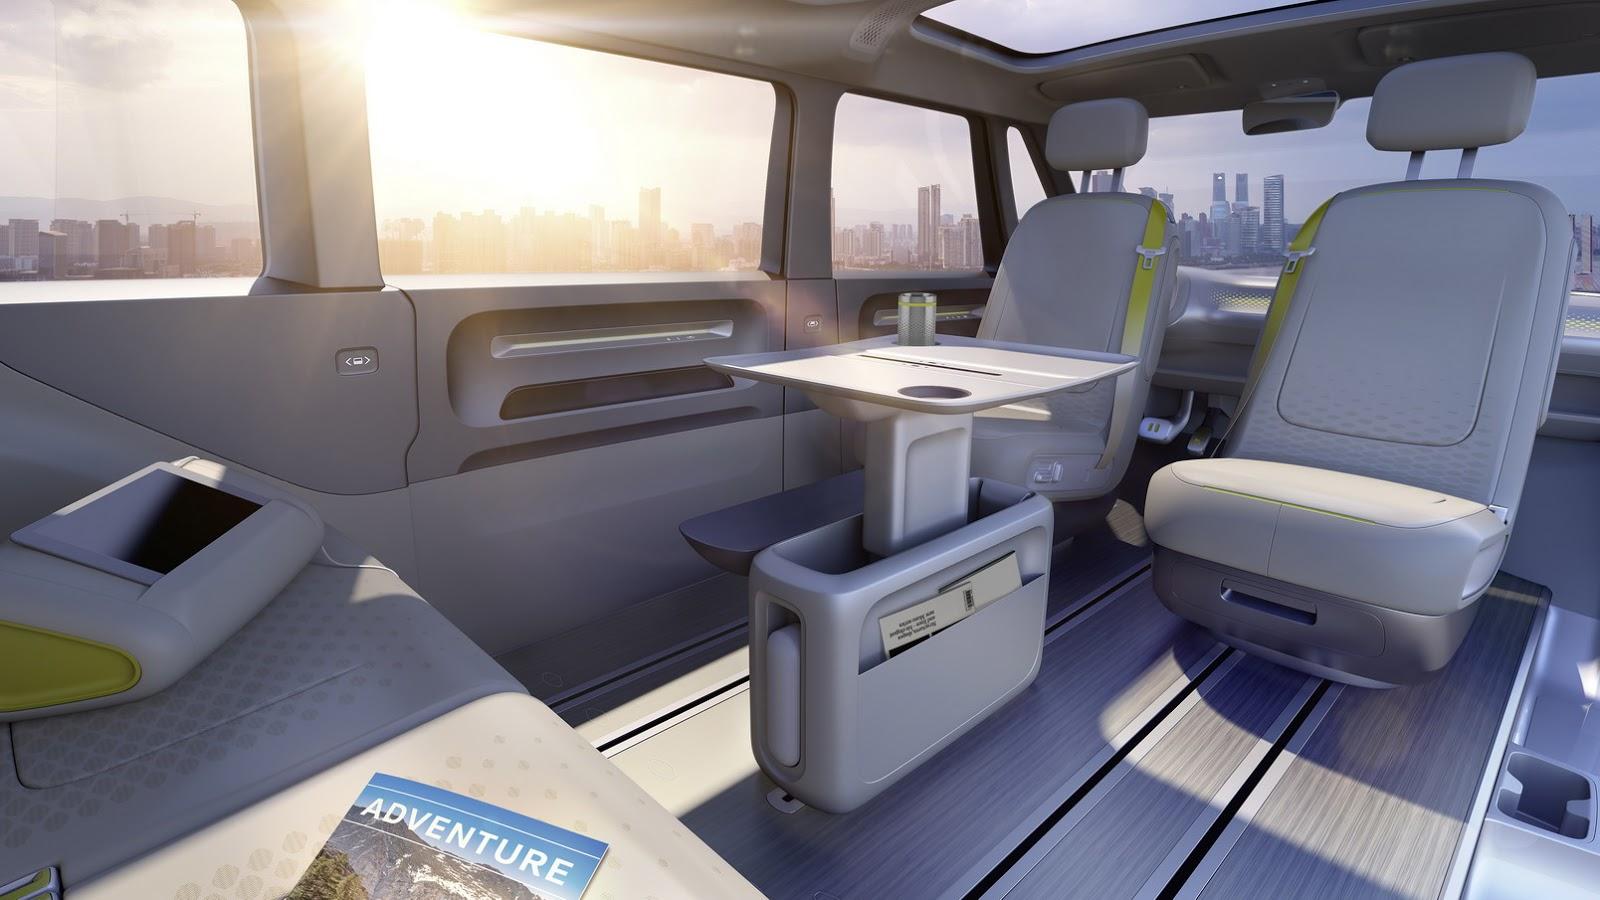 Volkswagen I.D. Buzz Concept (25)